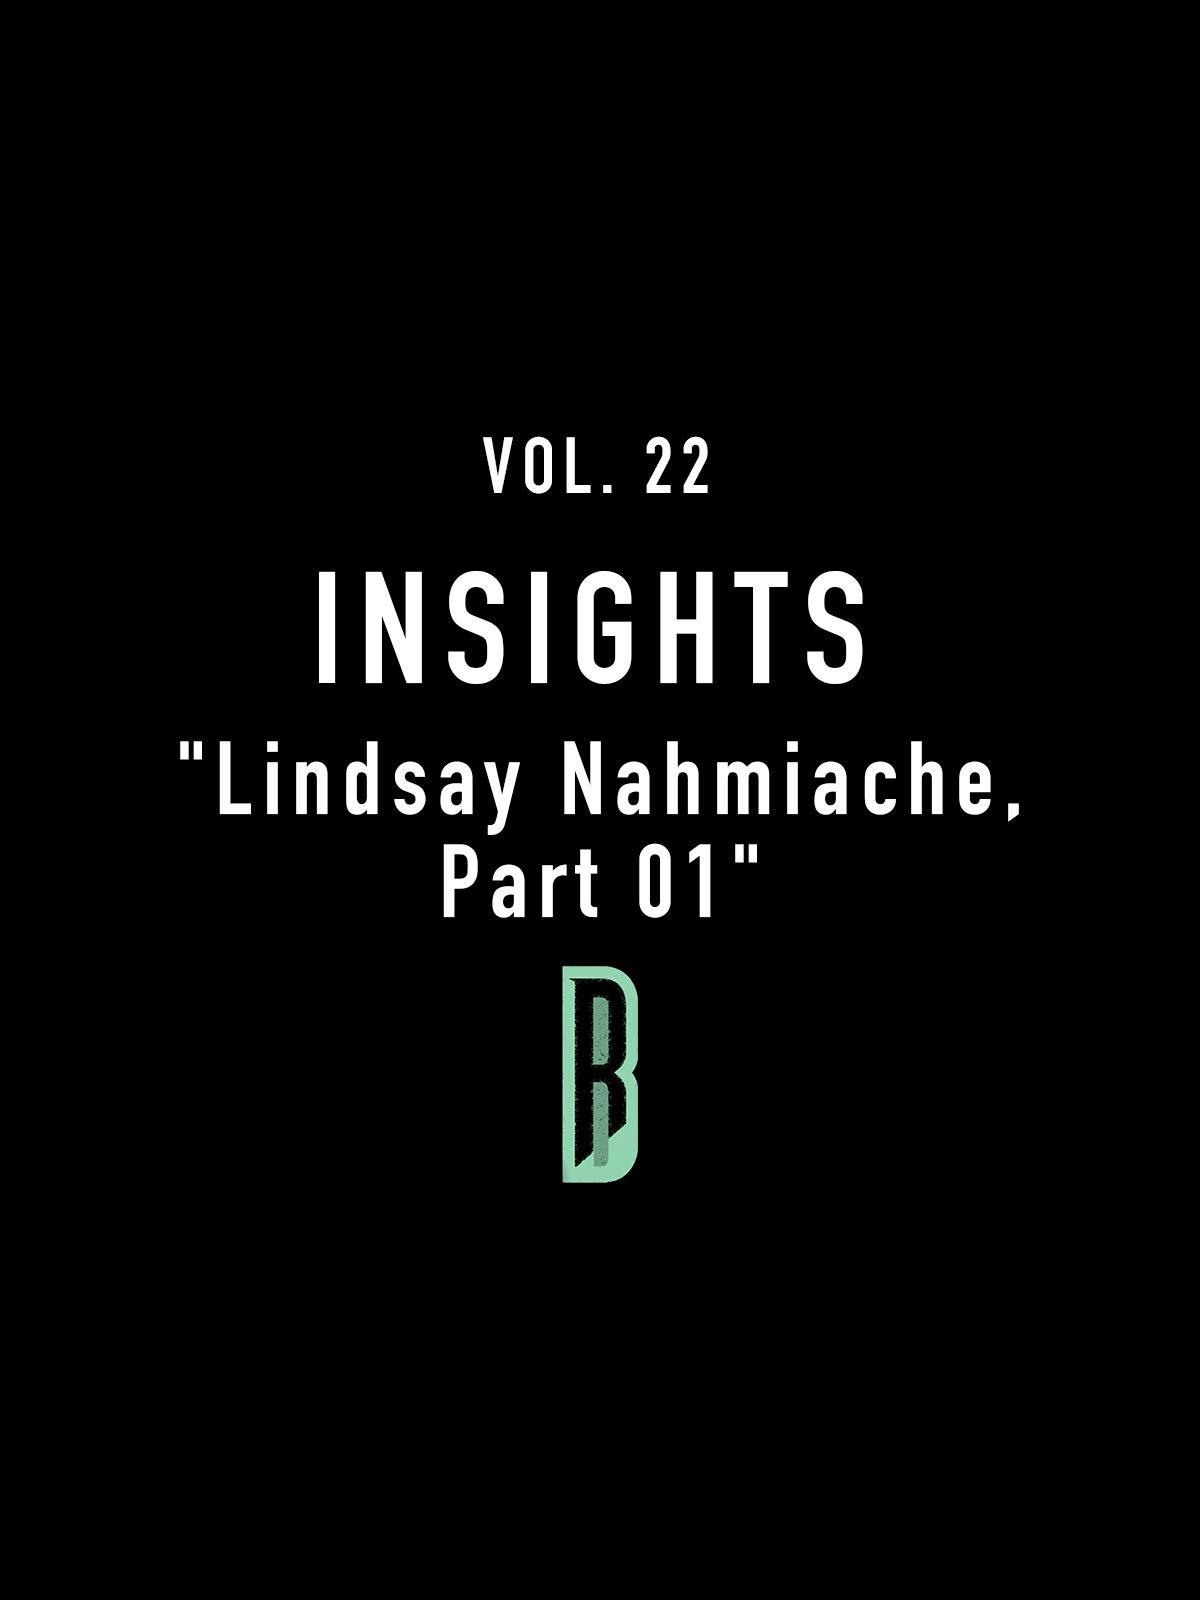 Insights Vol. 22